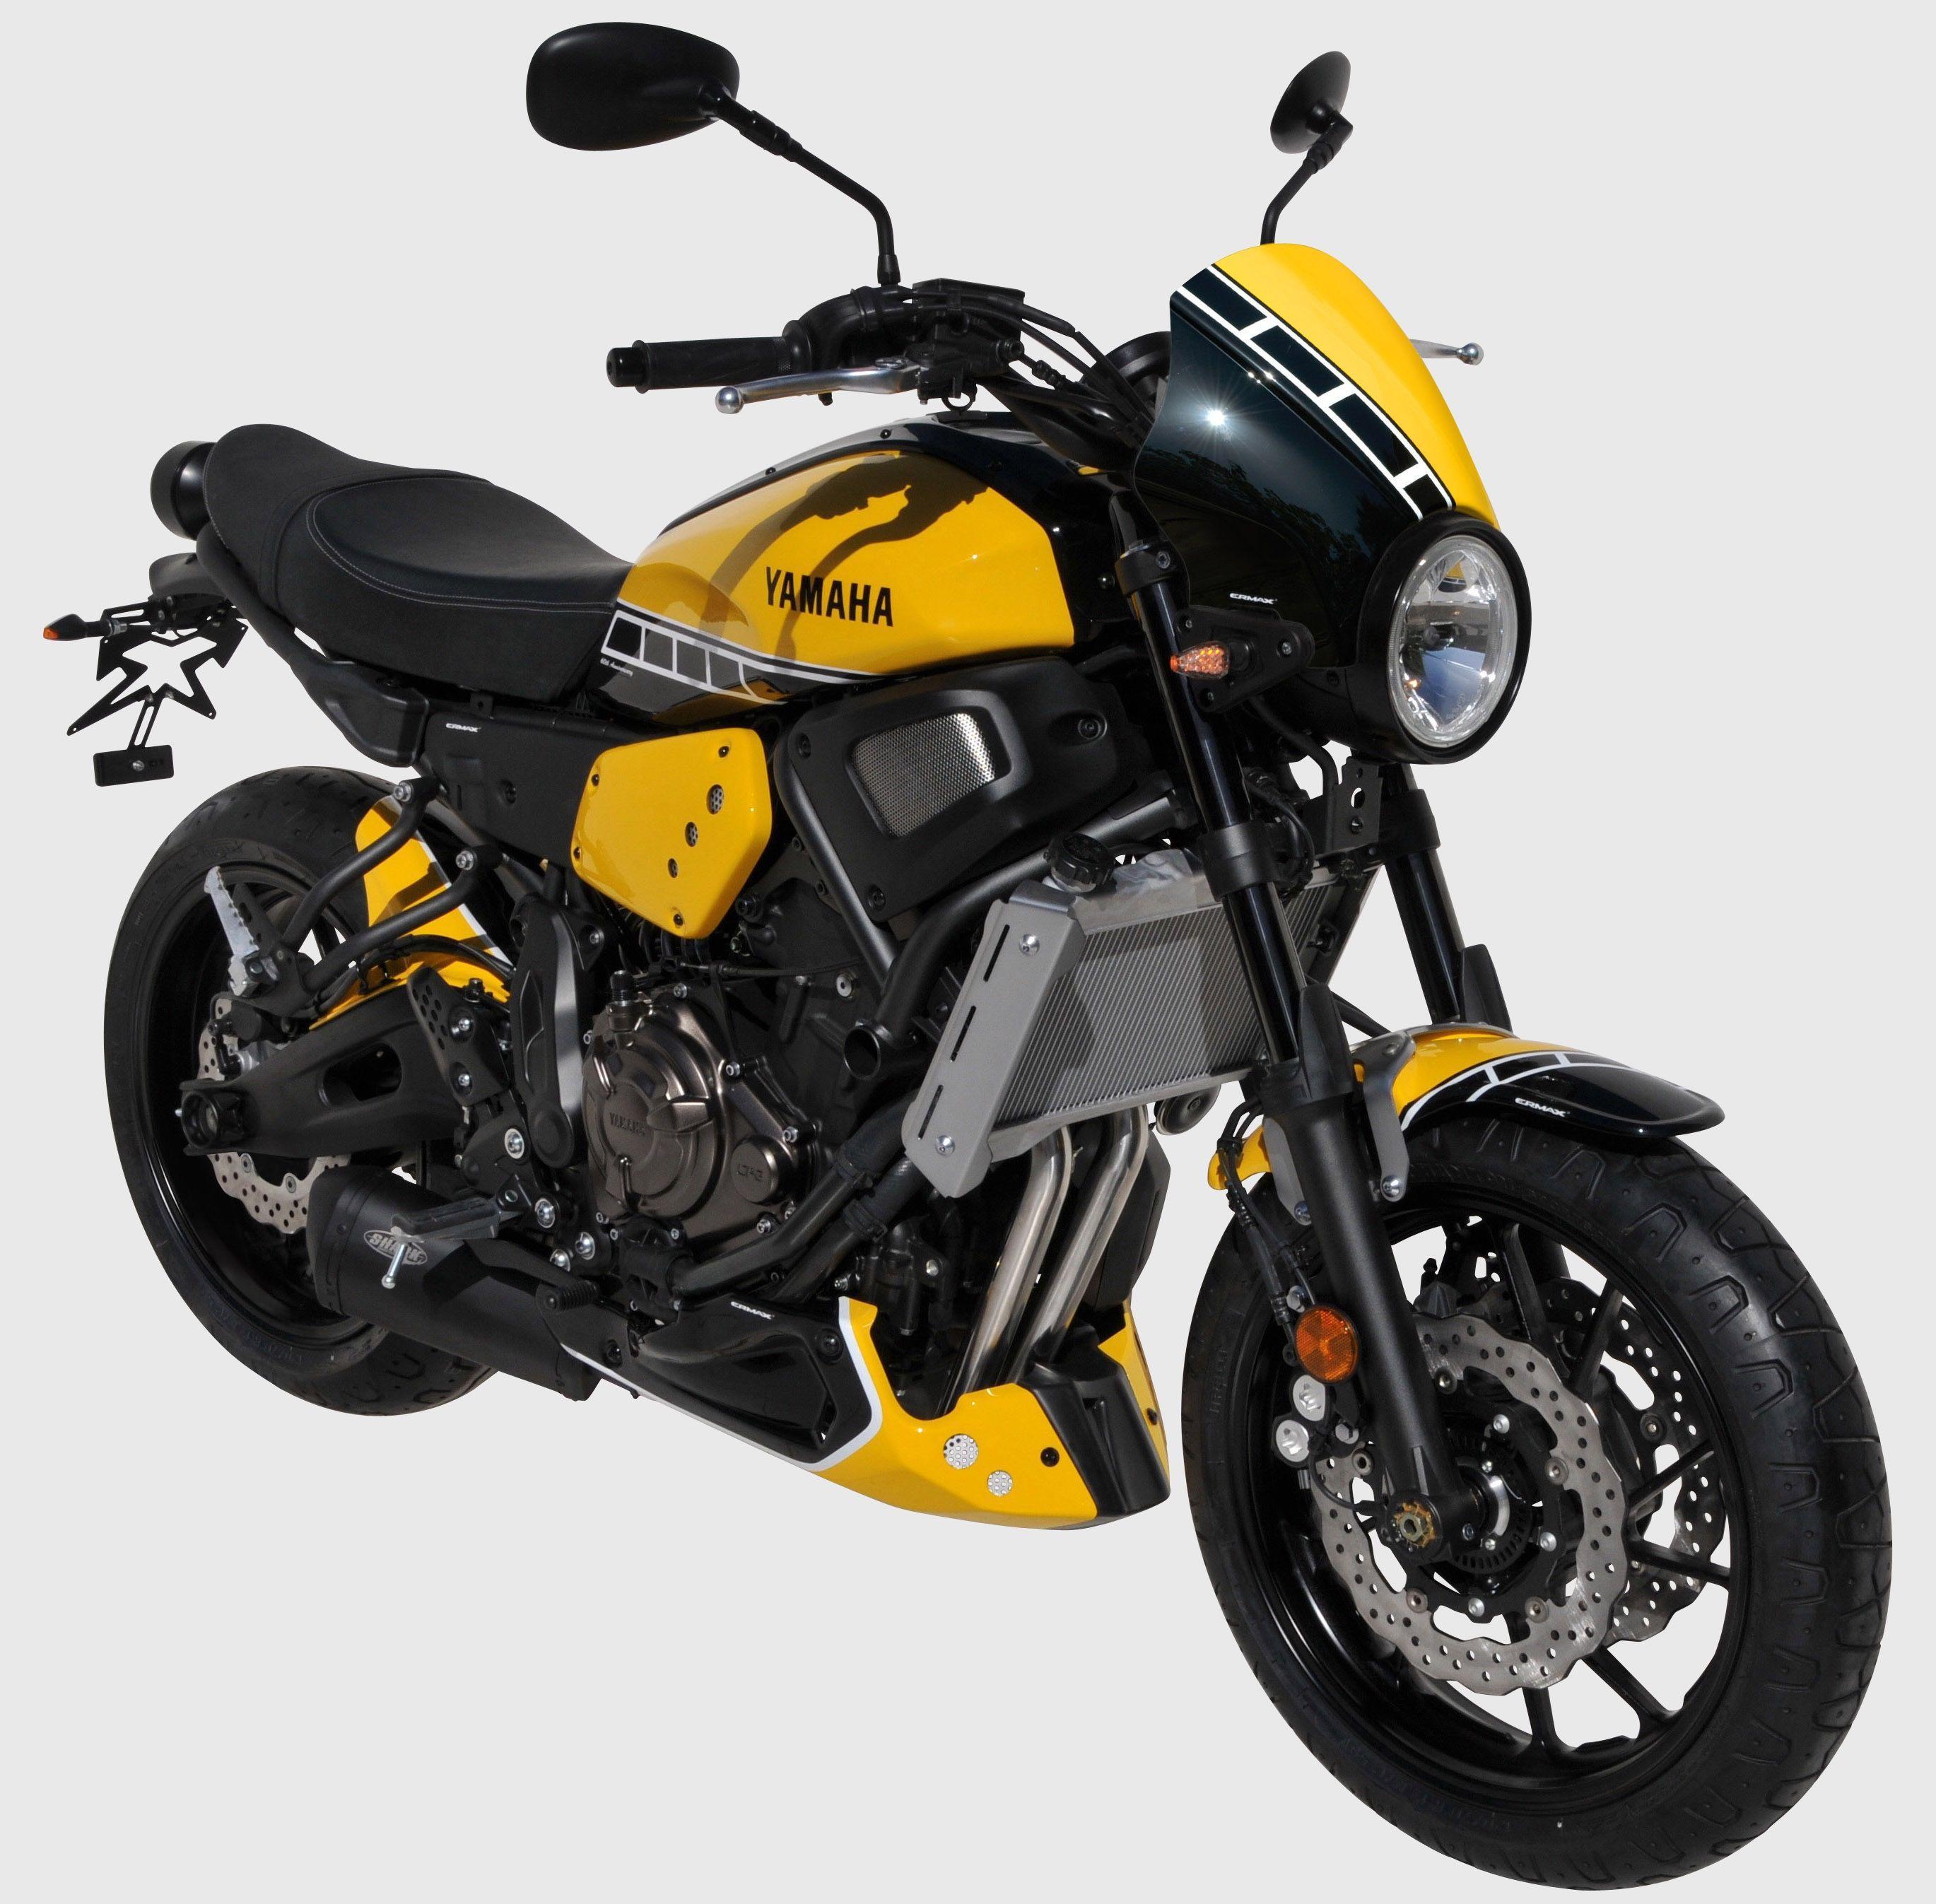 Impressionnant Dessin A Imprimer Moto Yamaha